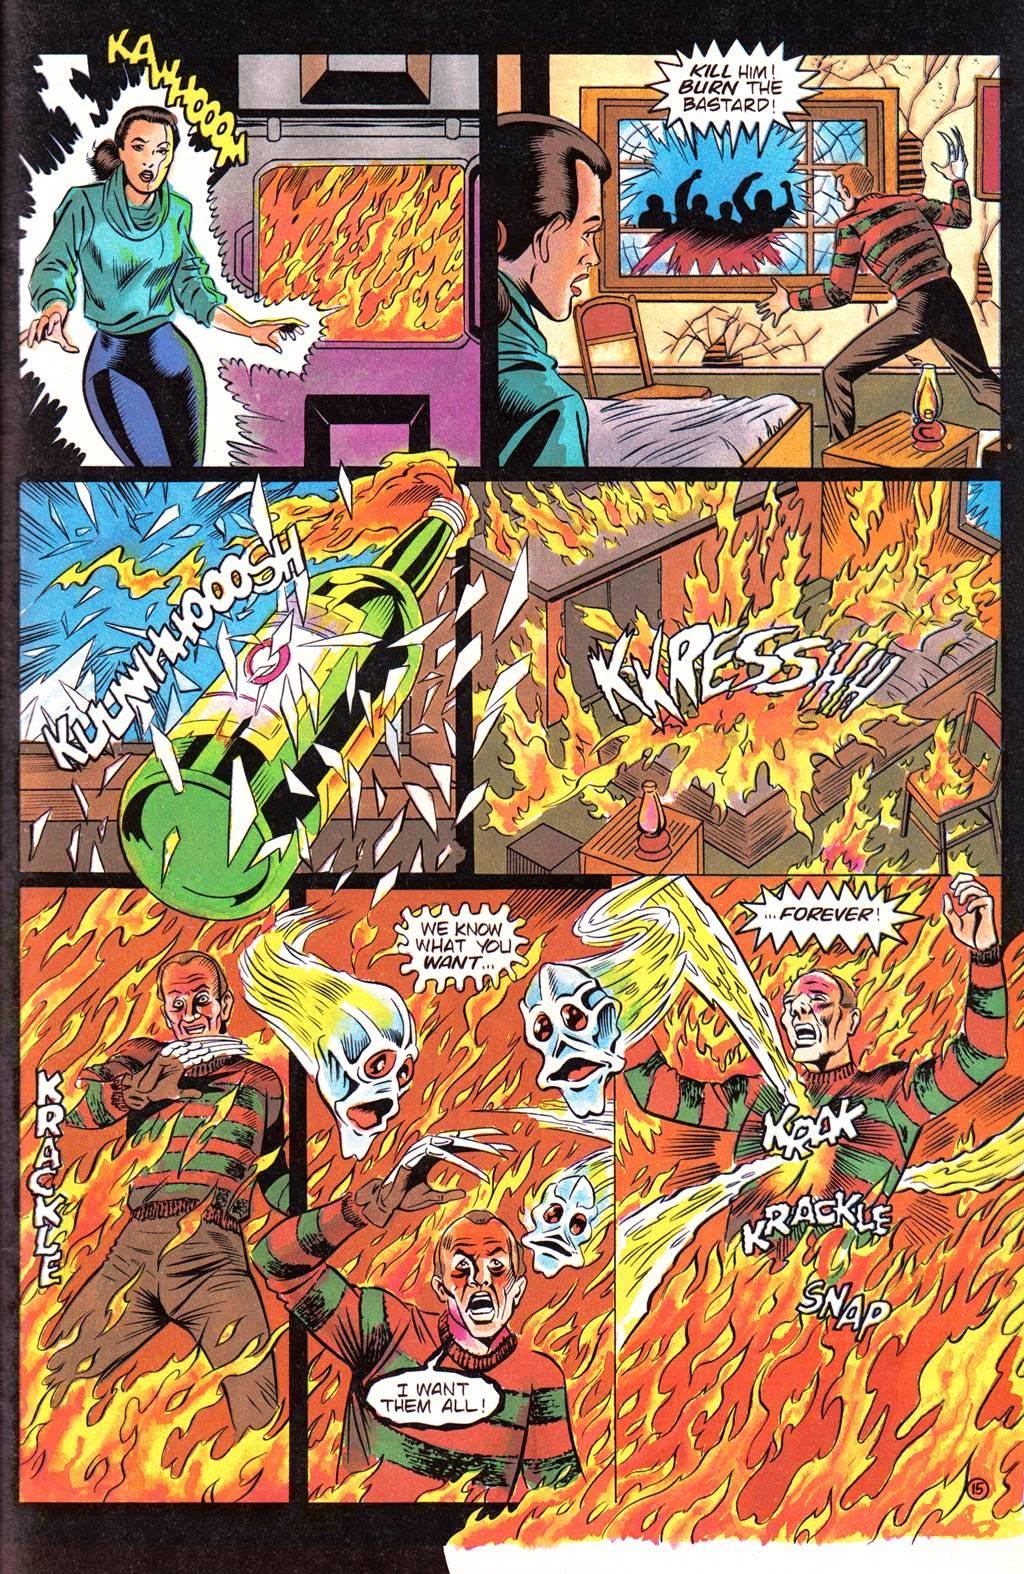 Read online Freddy's Dead: The Final Nightmare comic -  Issue #3 - 18